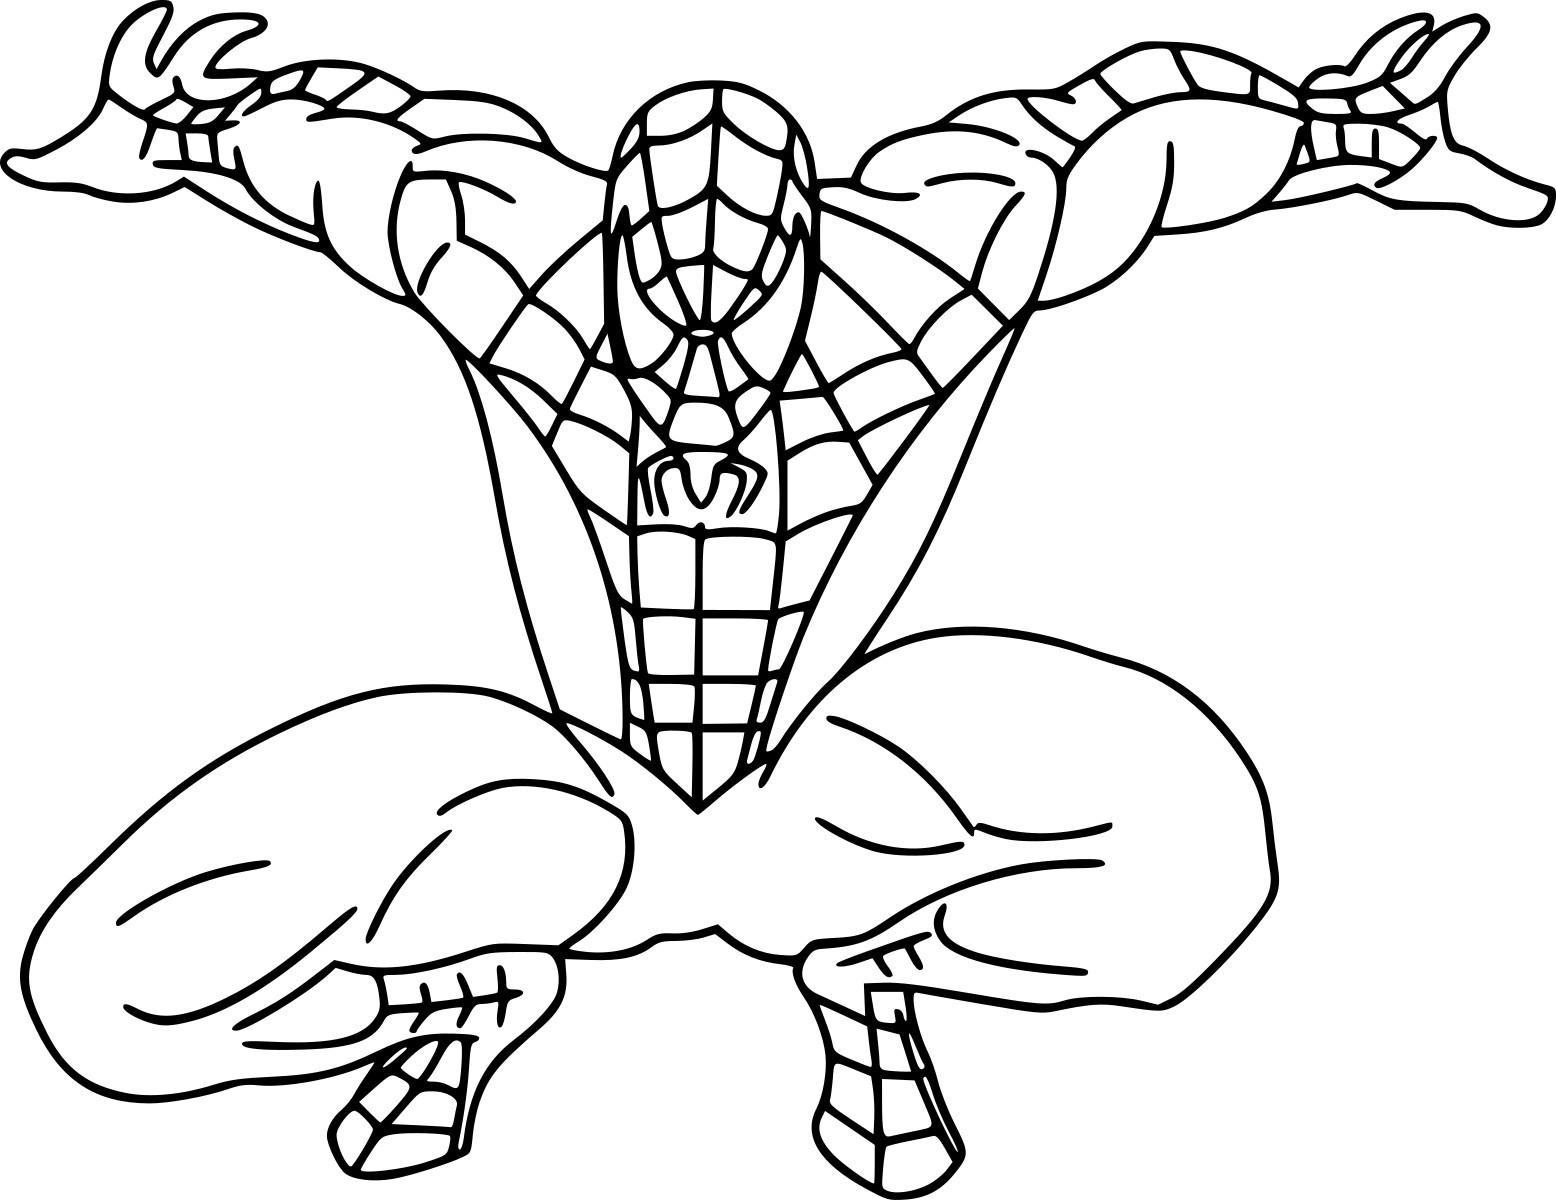 Coloriage spiderman 4 dessin imprimer sur coloriages info - Dessin spiderman ...